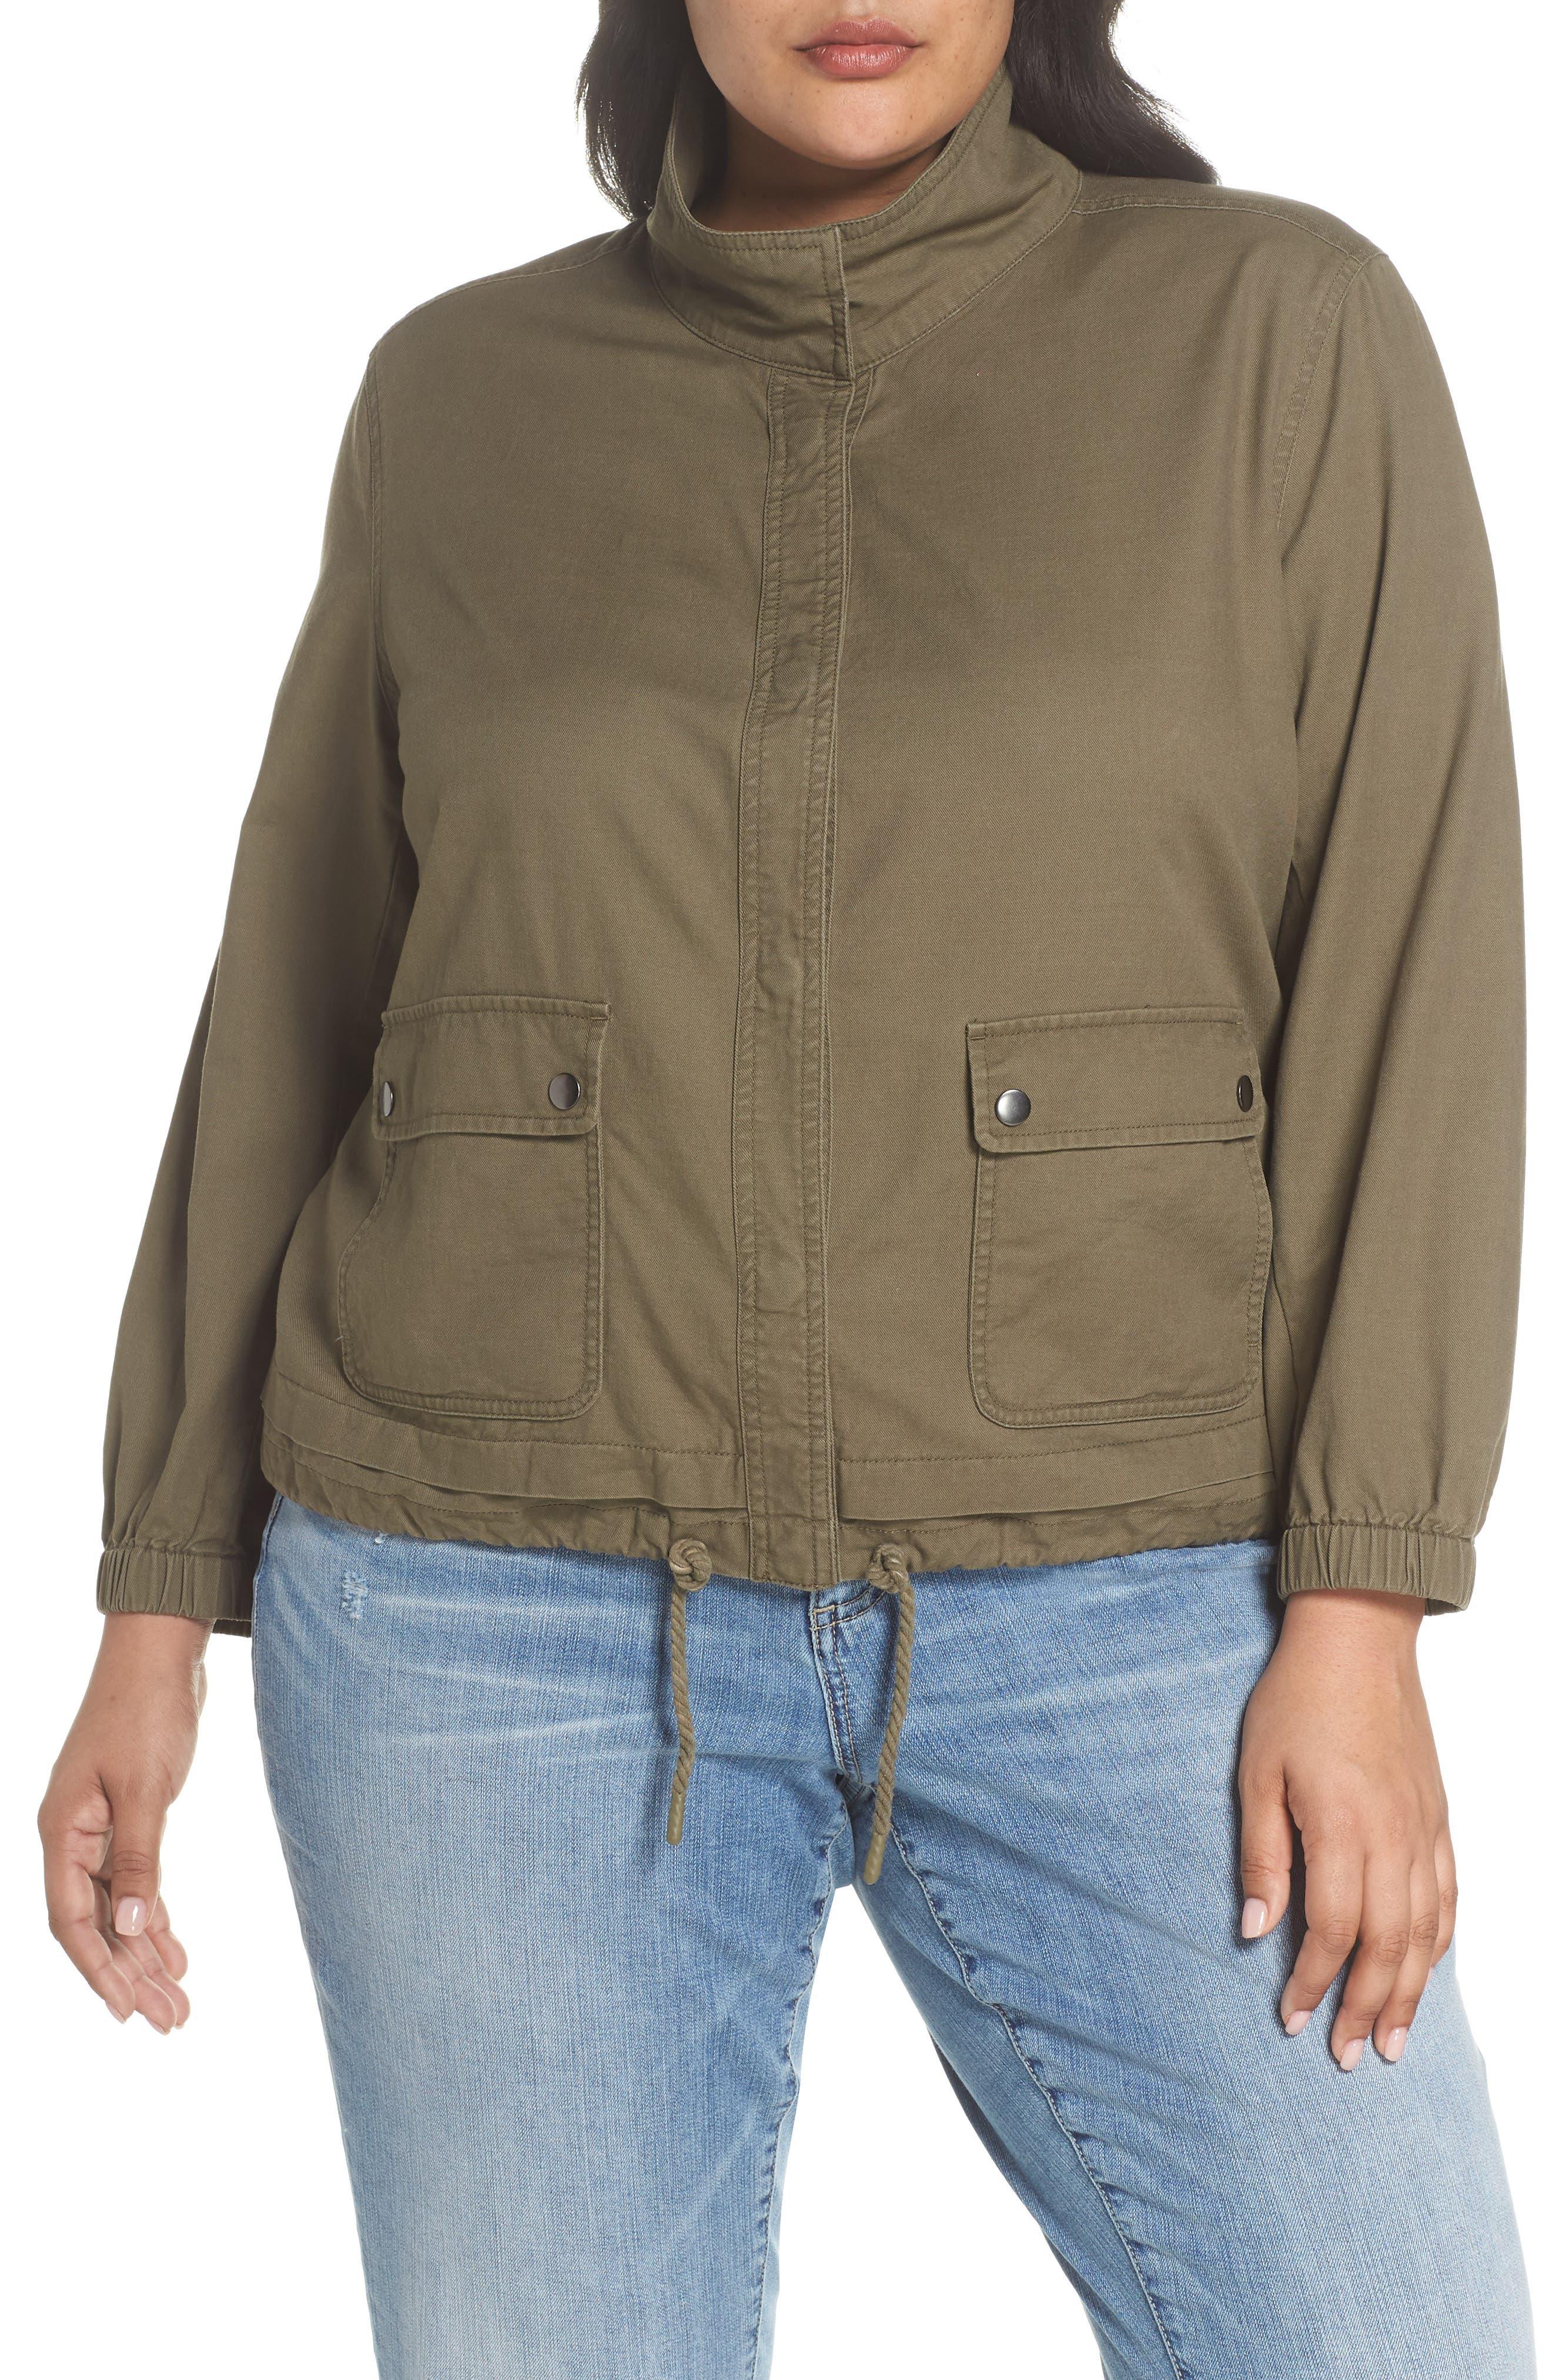 Snap Pocket Utility Jacket,                             Alternate thumbnail 4, color,                             Olive Kalamata